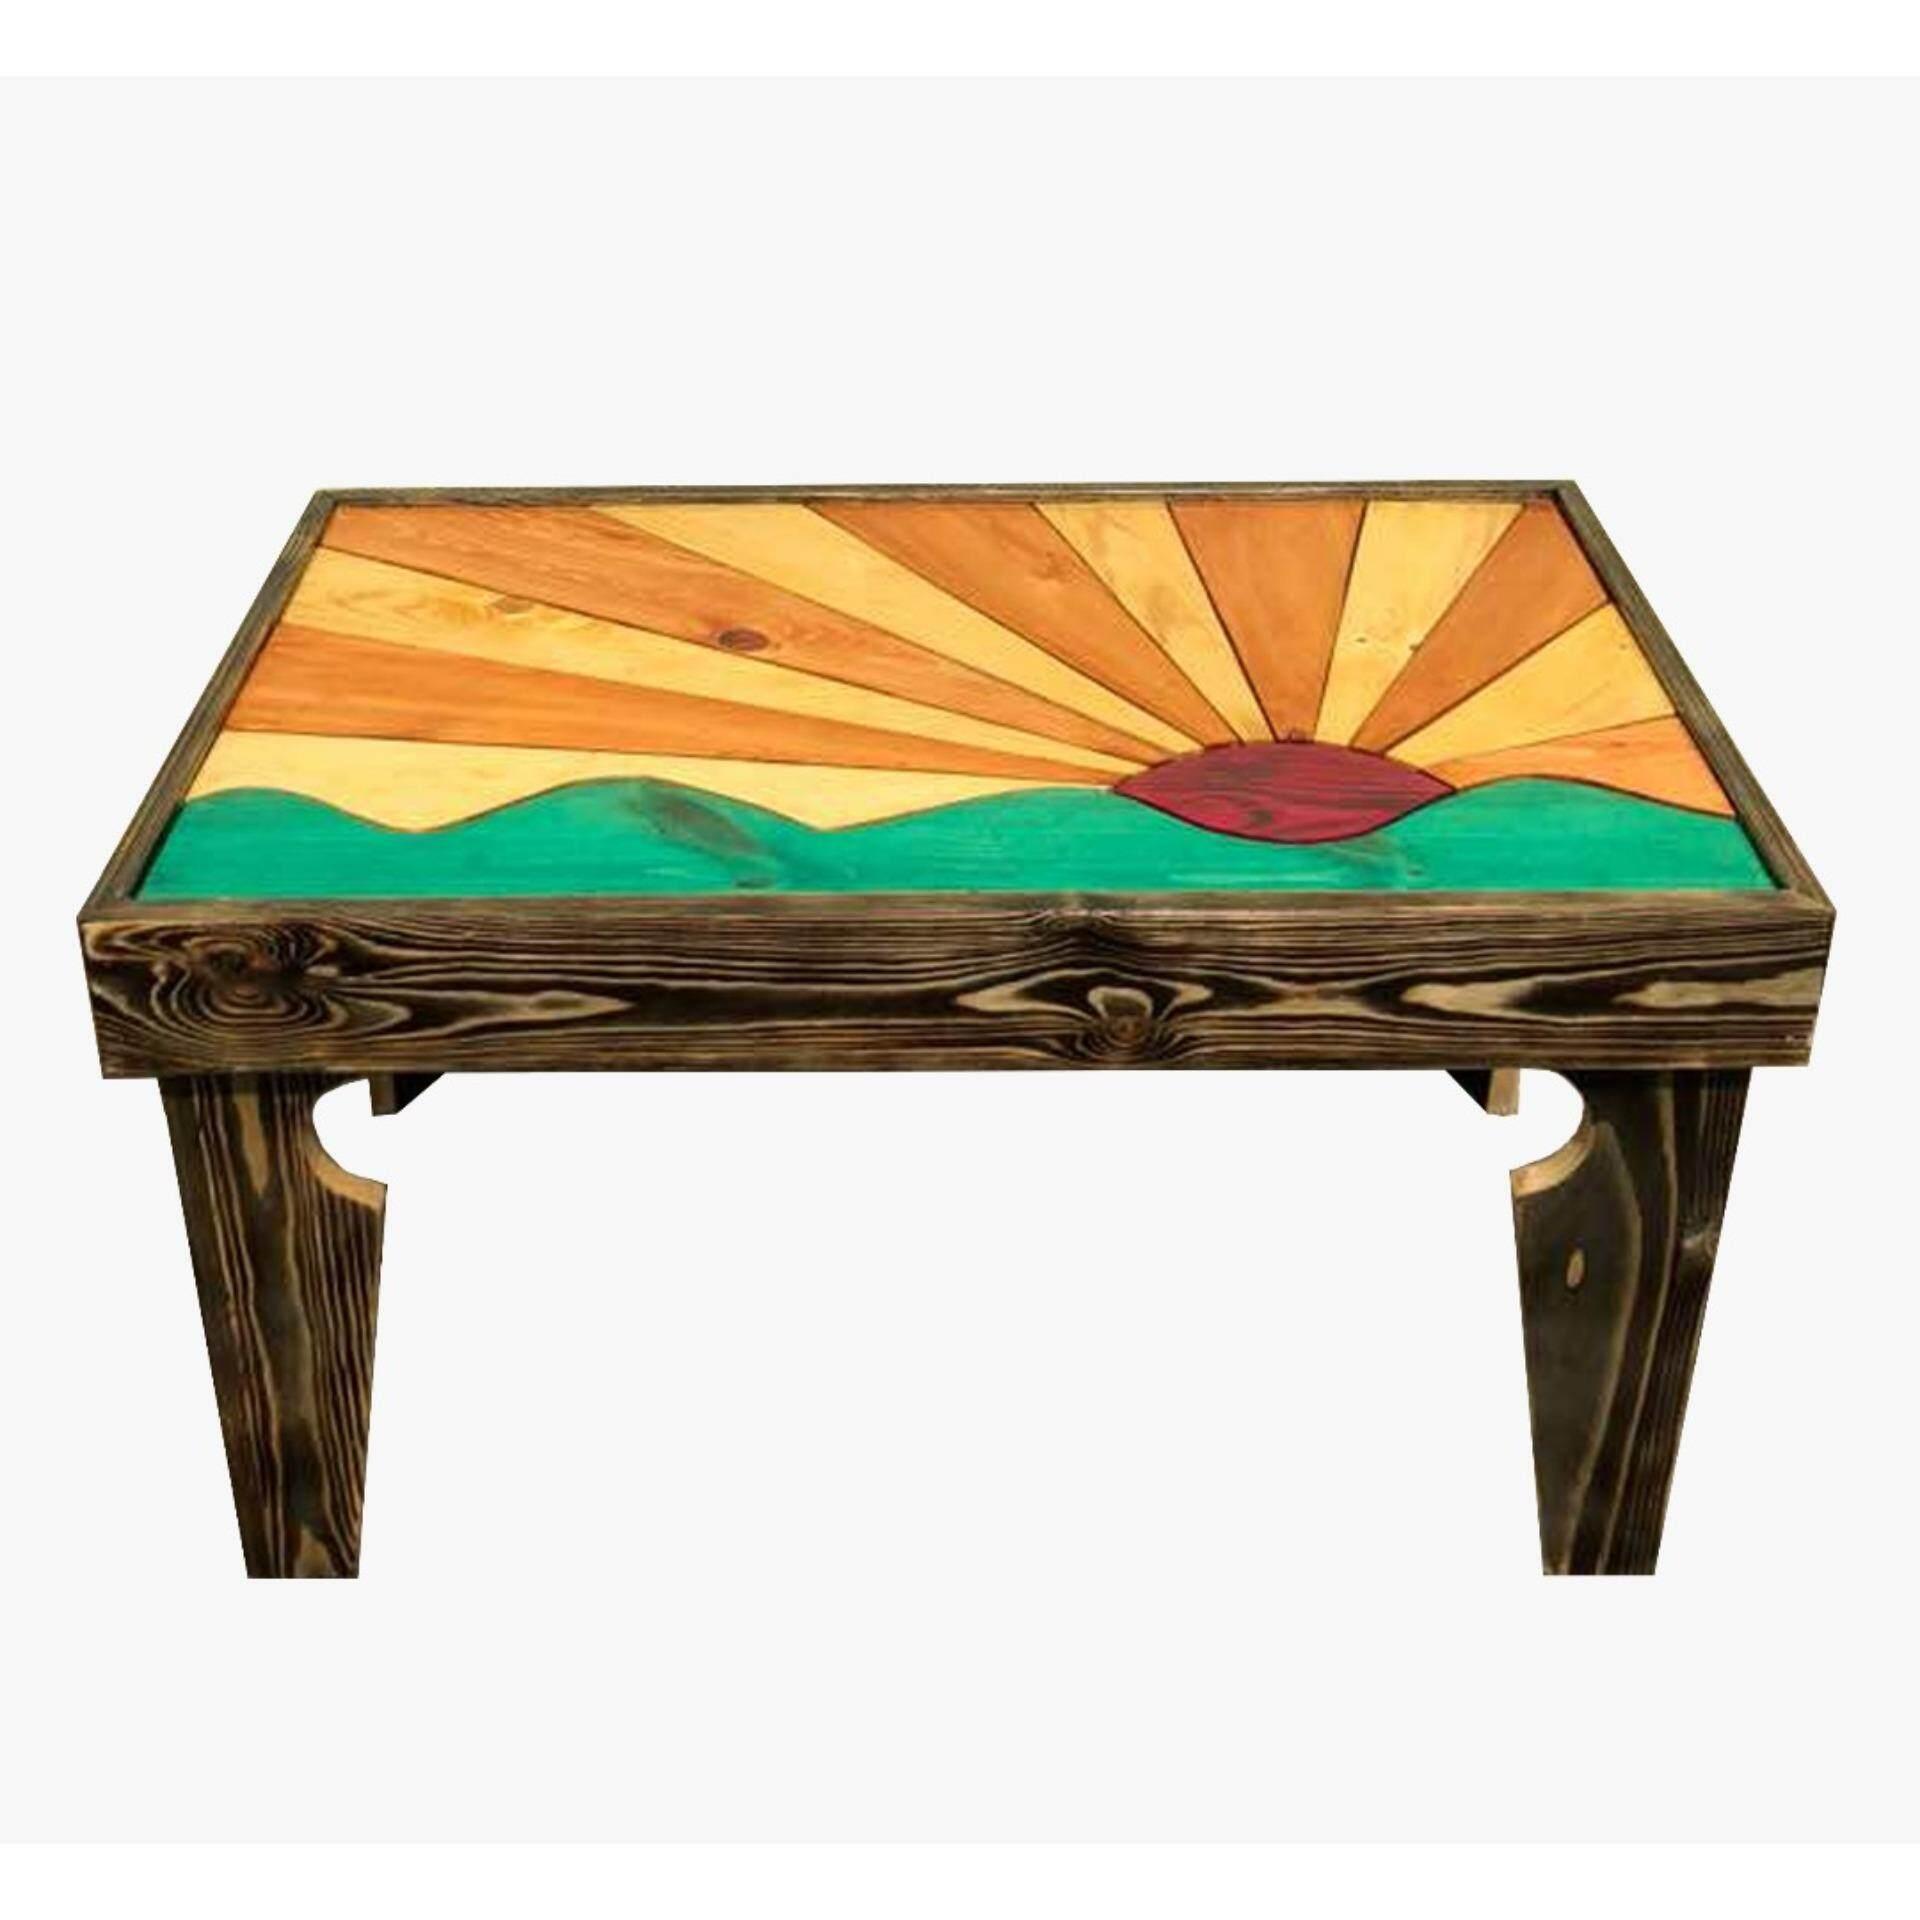 Ladubee Pine Wood Coffee Table (Rising Sun) (3ft x 2ft x 1.5ft)